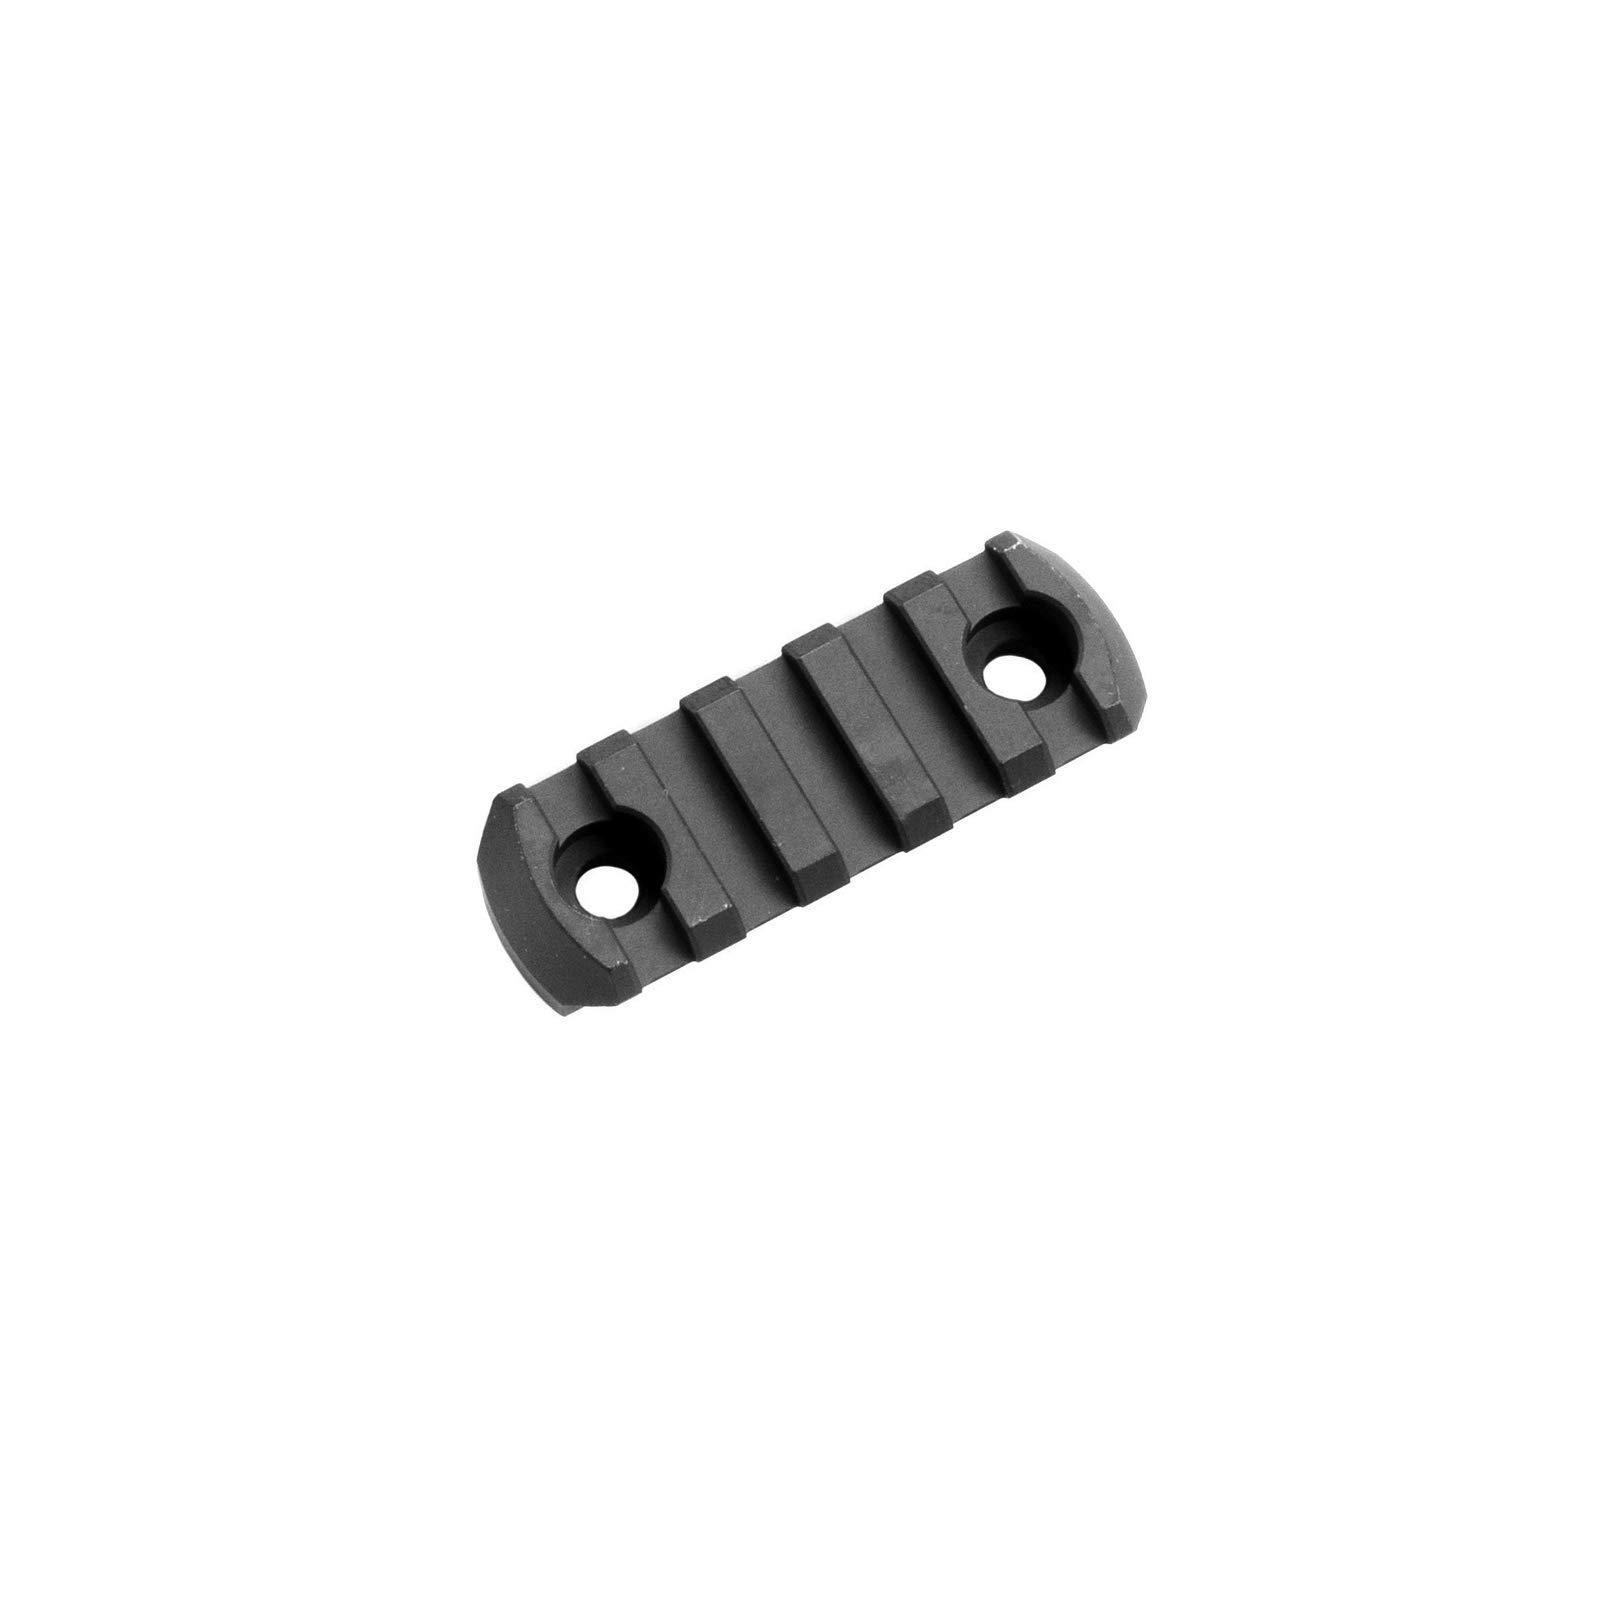 Magpul M-LOK Aluminum Picatinny Accessory Rail, 5 Slots by Magpul